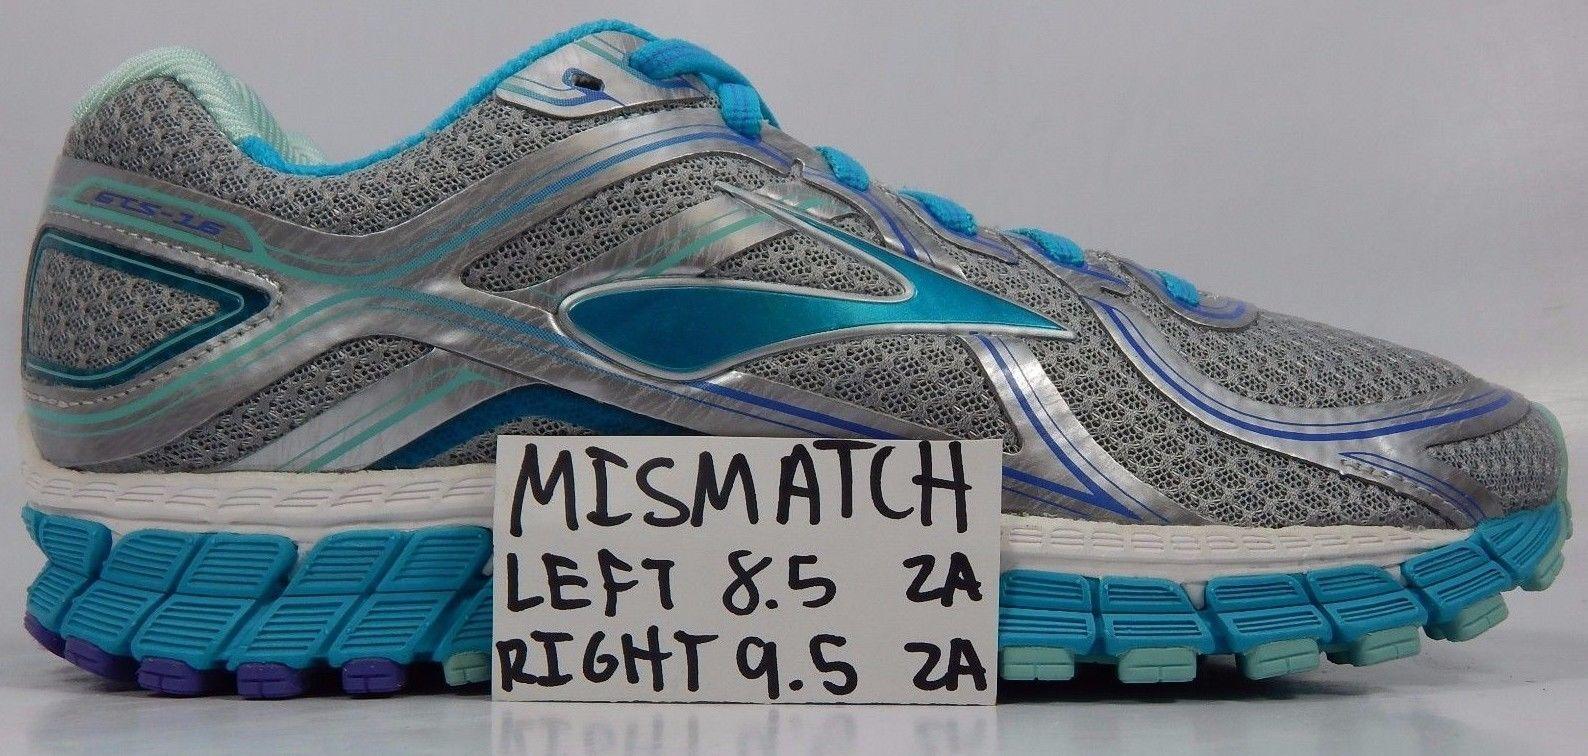 MISMATCH Brooks GTS 16 Women's Shoes Size 8.5 2A Left & Size 9.5 2A Right NARROW